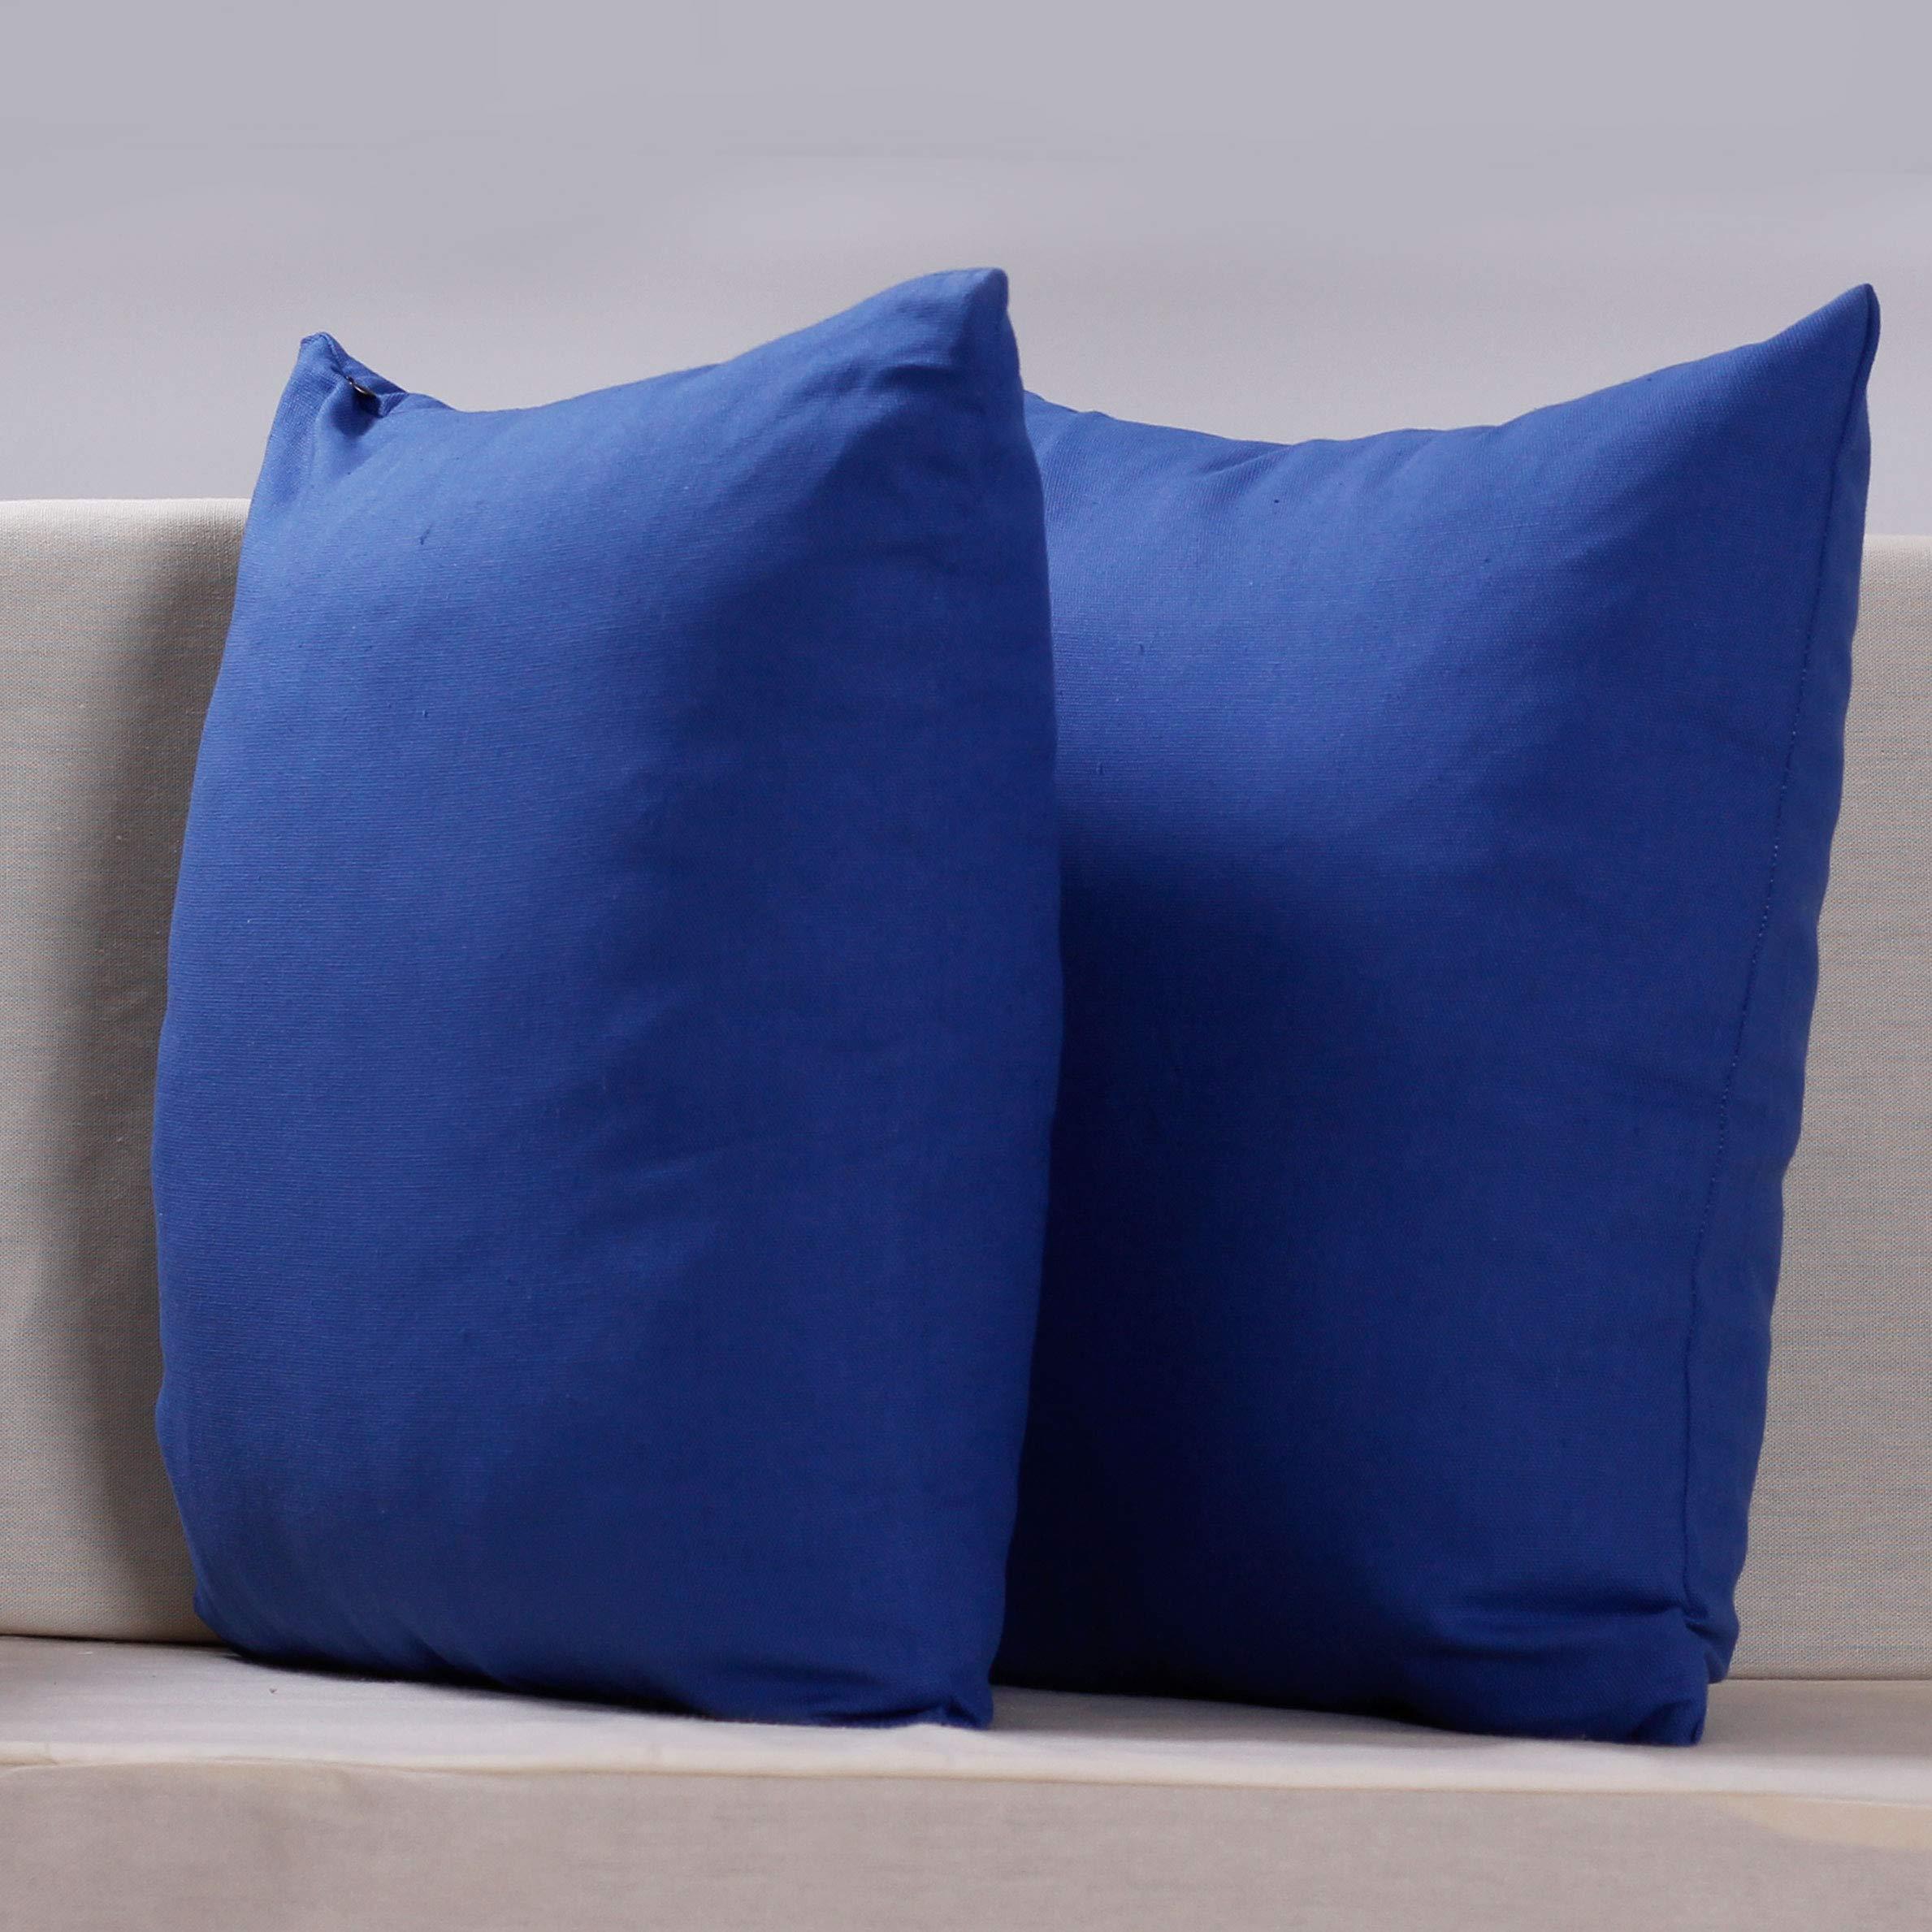 PimpamTex Pack de 2 Fundas de Cojín Decorativo Lino Algodón Suave, Cuadrado 45x45 cm, Funda de Almohada para Cama, Sofá, Silla o Dormitorio, Modelo Half Panamá – (45 x 45 cm, Azulina): Amazon.es: Hogar